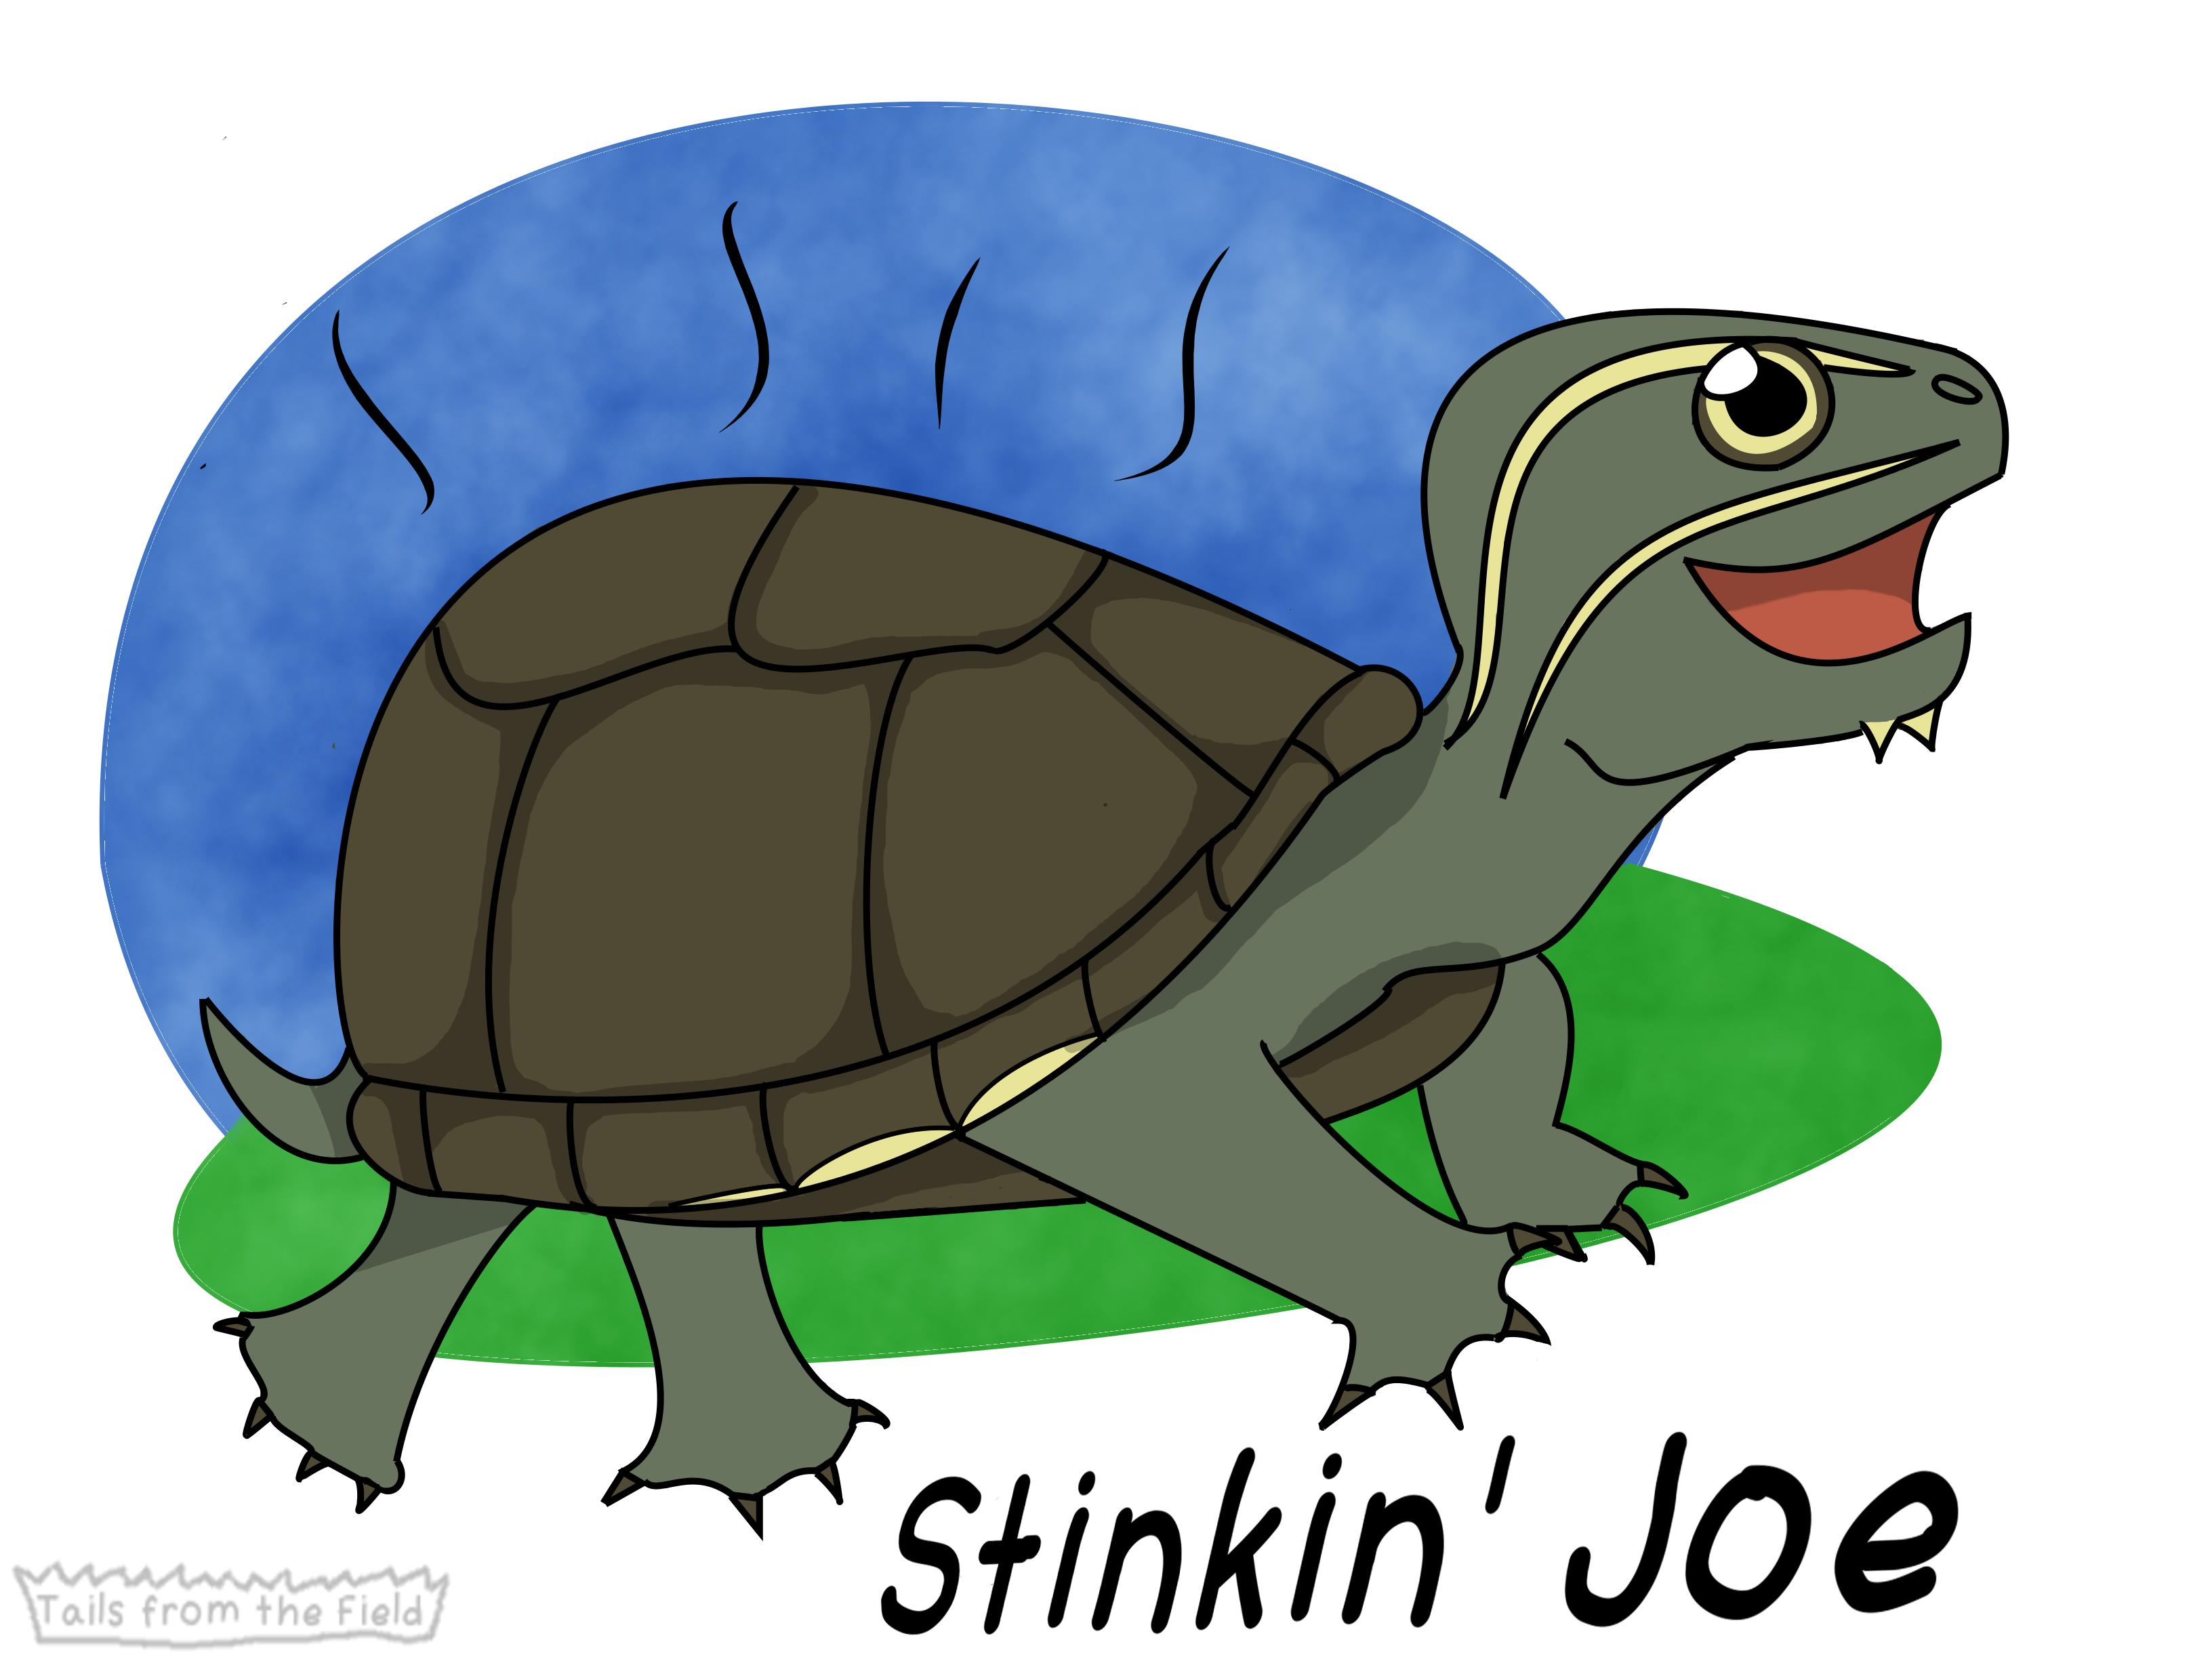 3. Stinkin' Joe